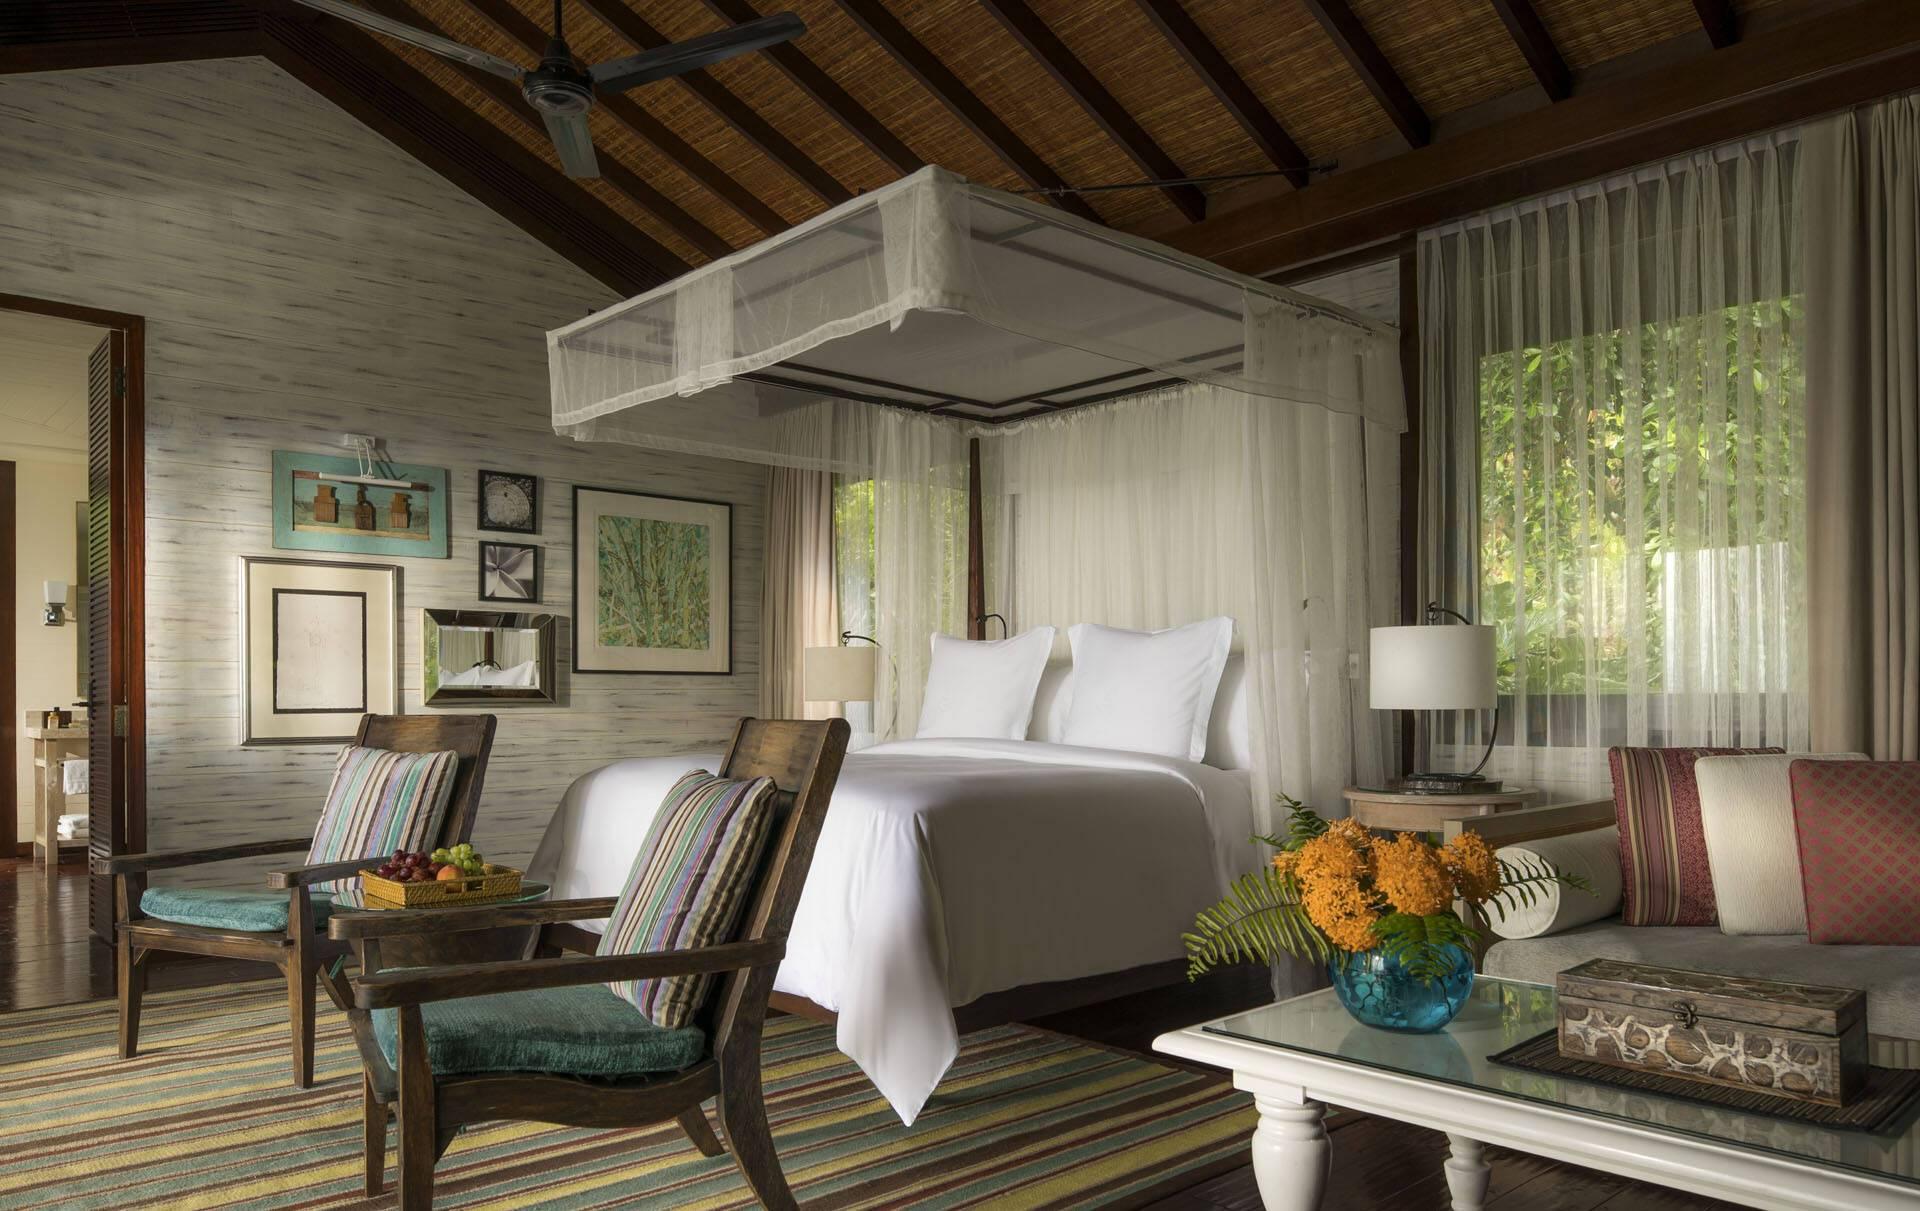 Four Seasons Seychelles Residence Villa ChambreJPG